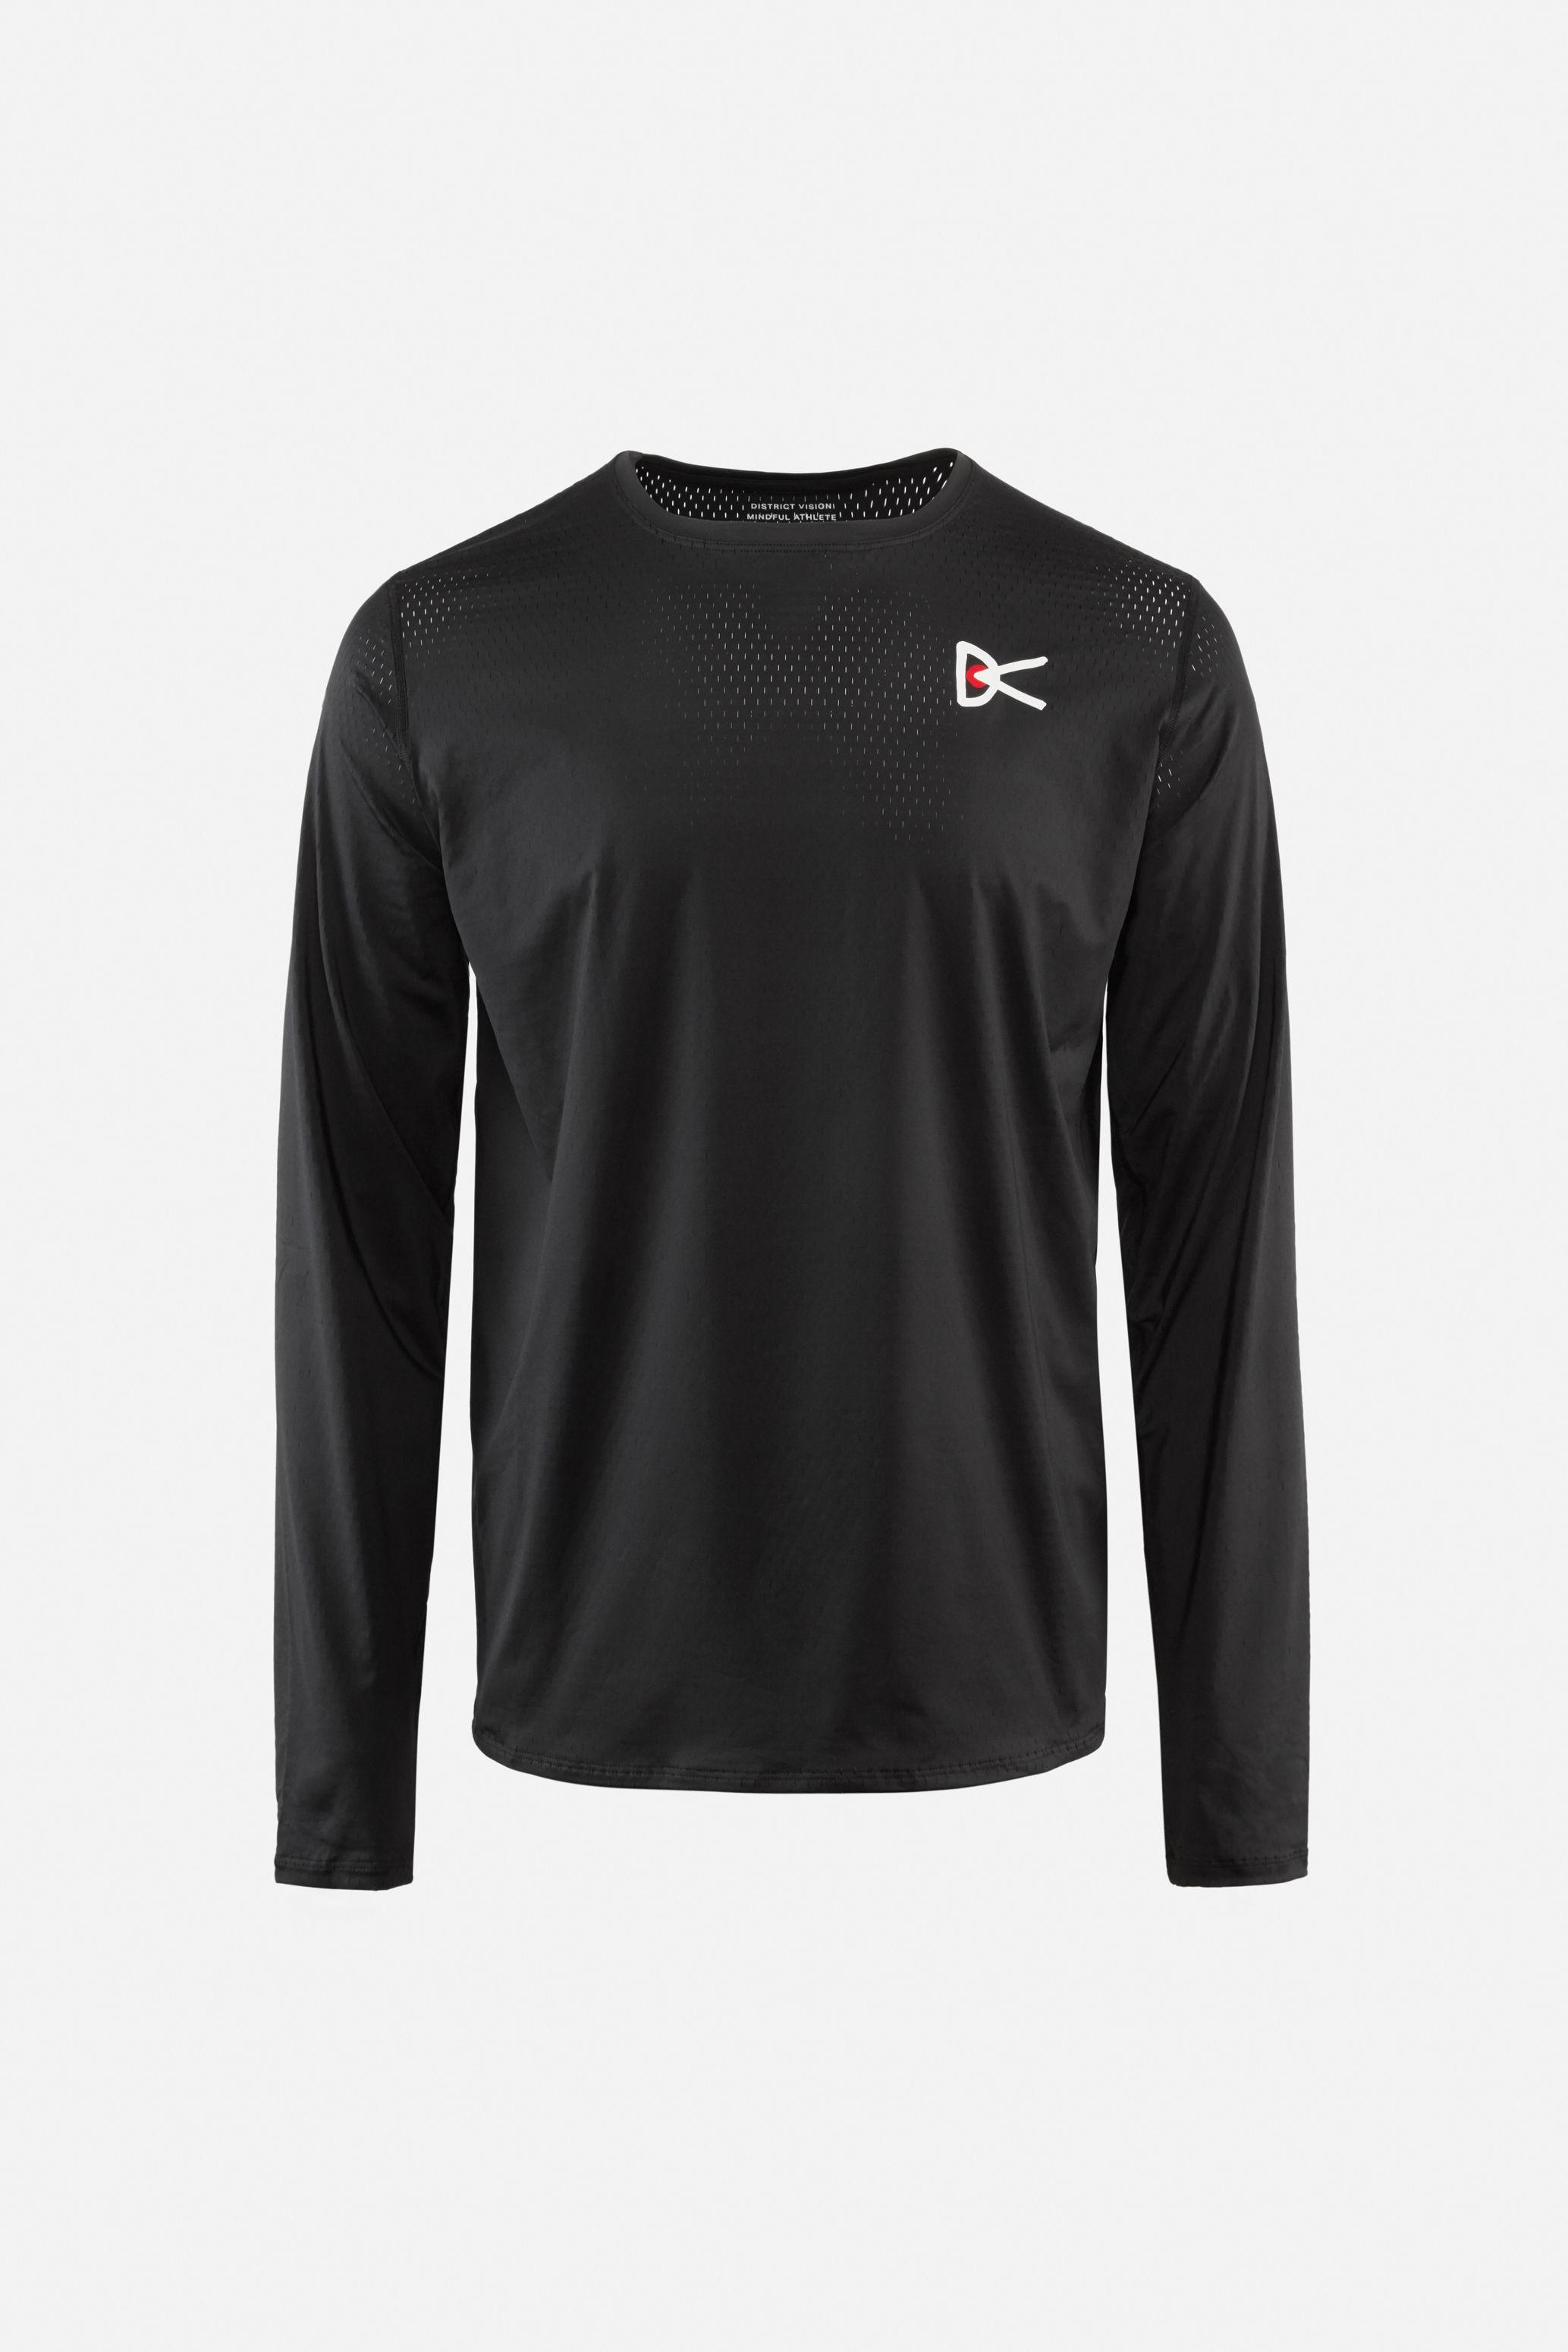 Air––Wear Long Sleeve T-Shirt, Black